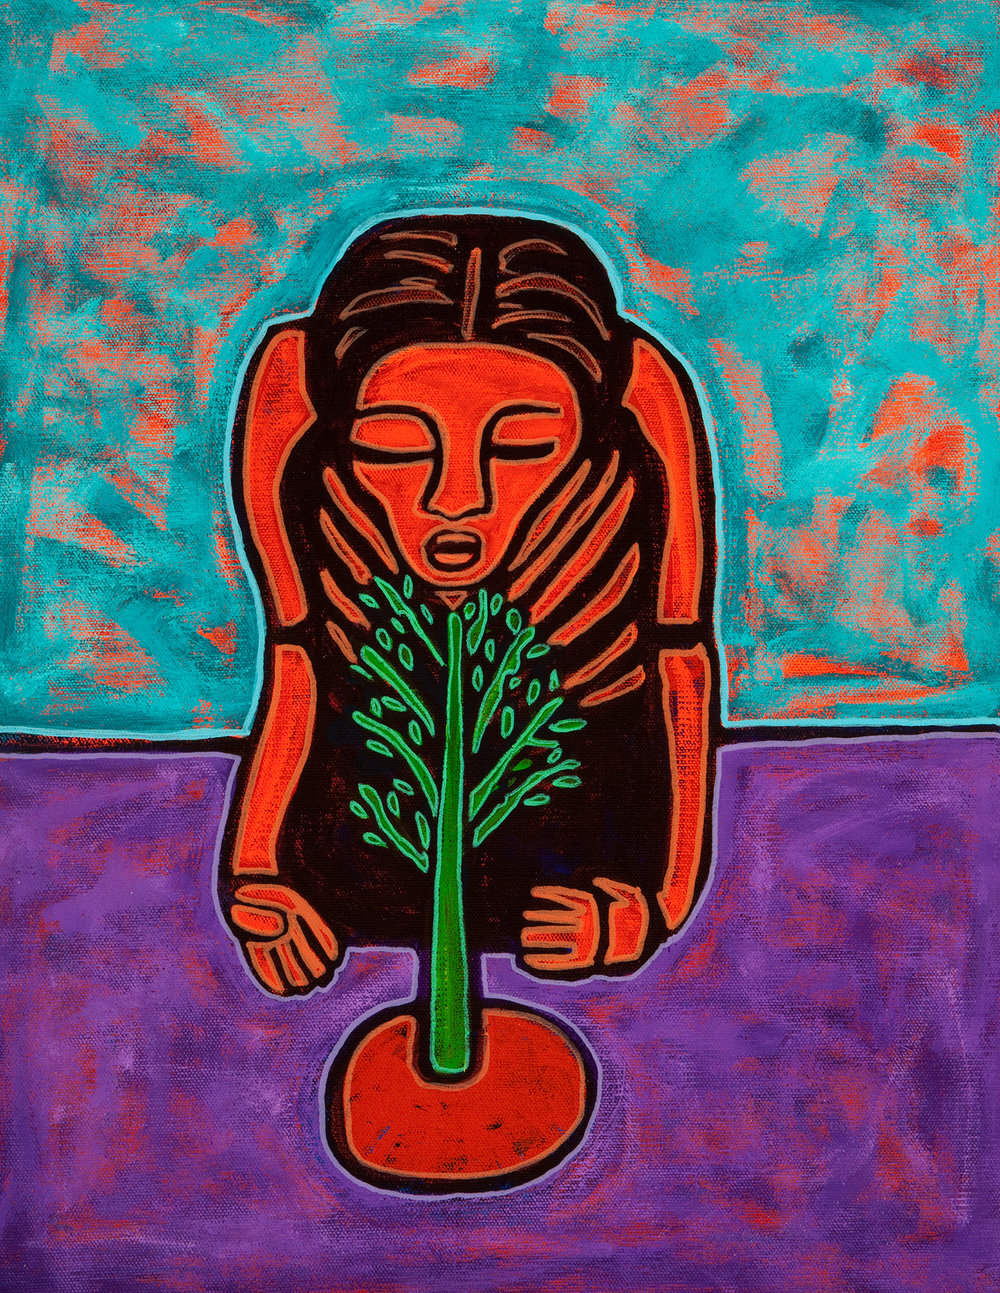 jardinero, 2010, 12x14